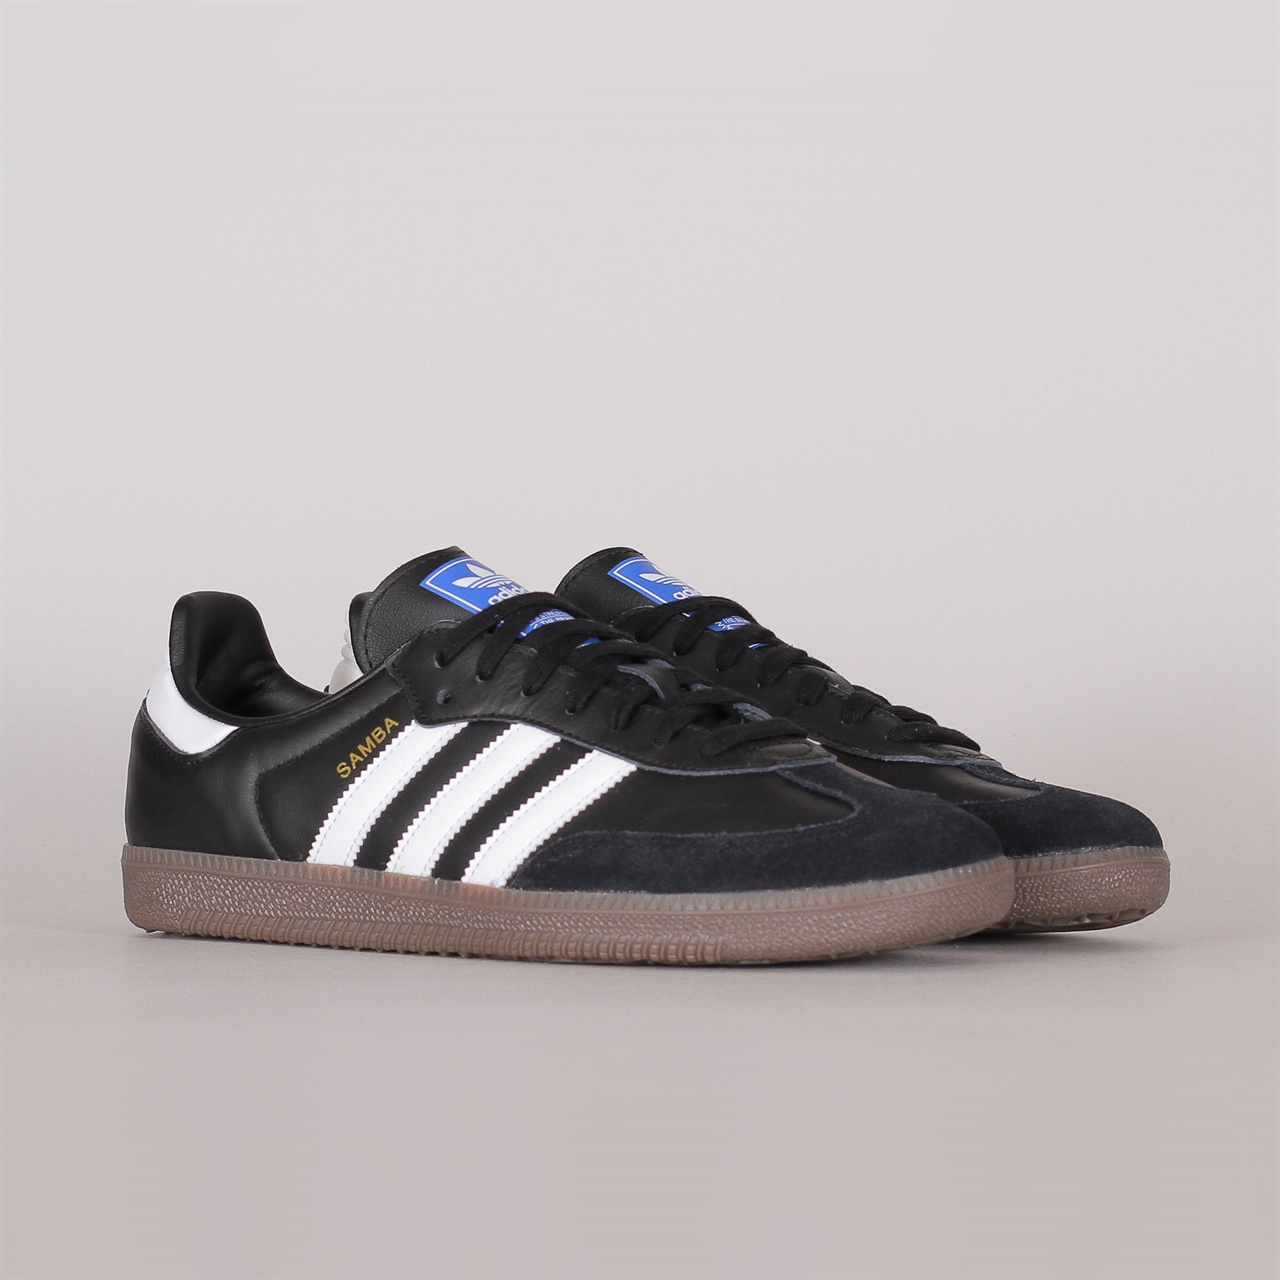 Shelta - Adidas Originals Samba OG (B75807)